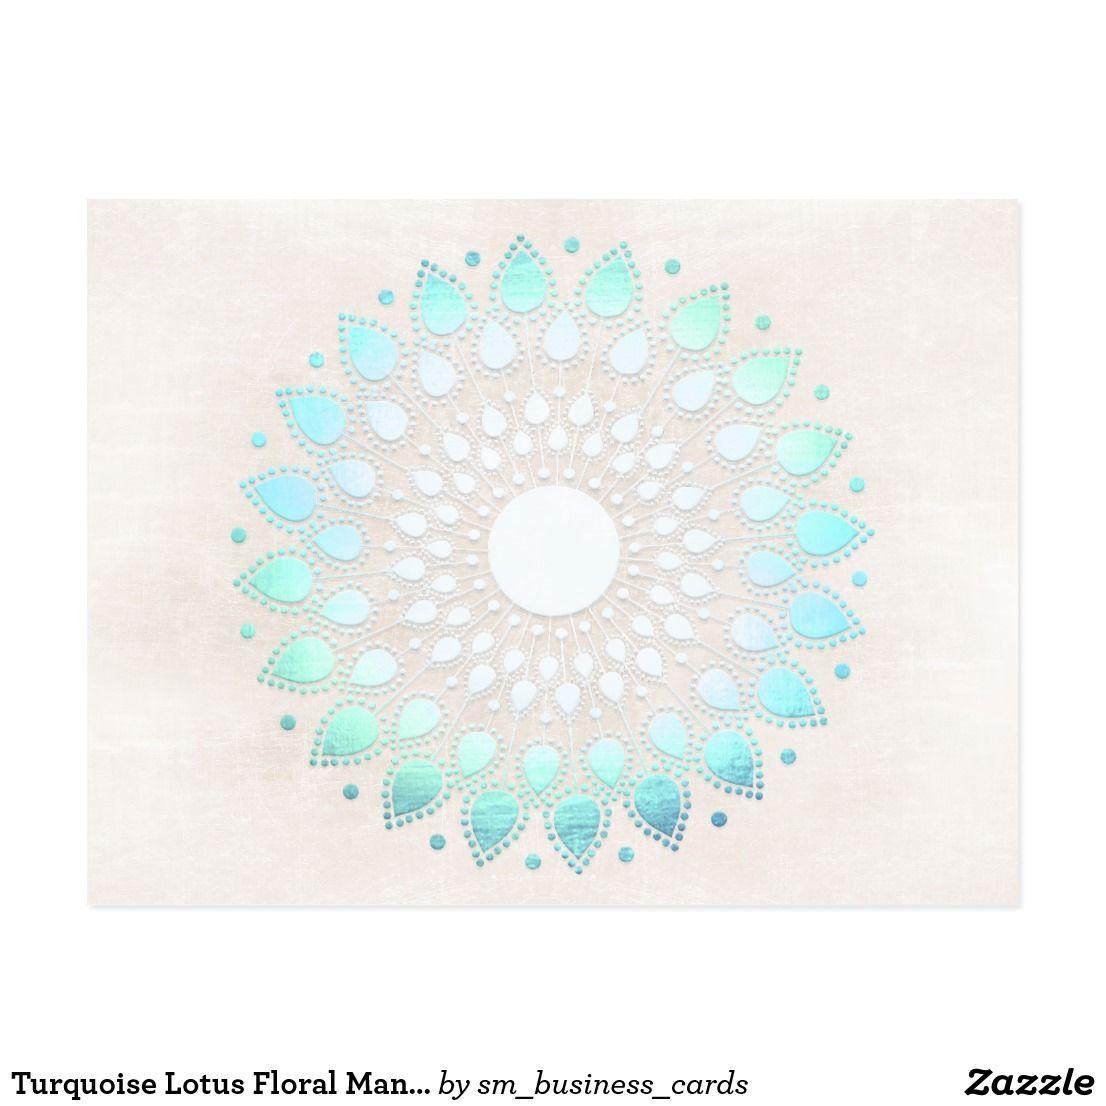 Turquoise Lotus Floral Mandala Postcard Pinterest Mandala And Lotus